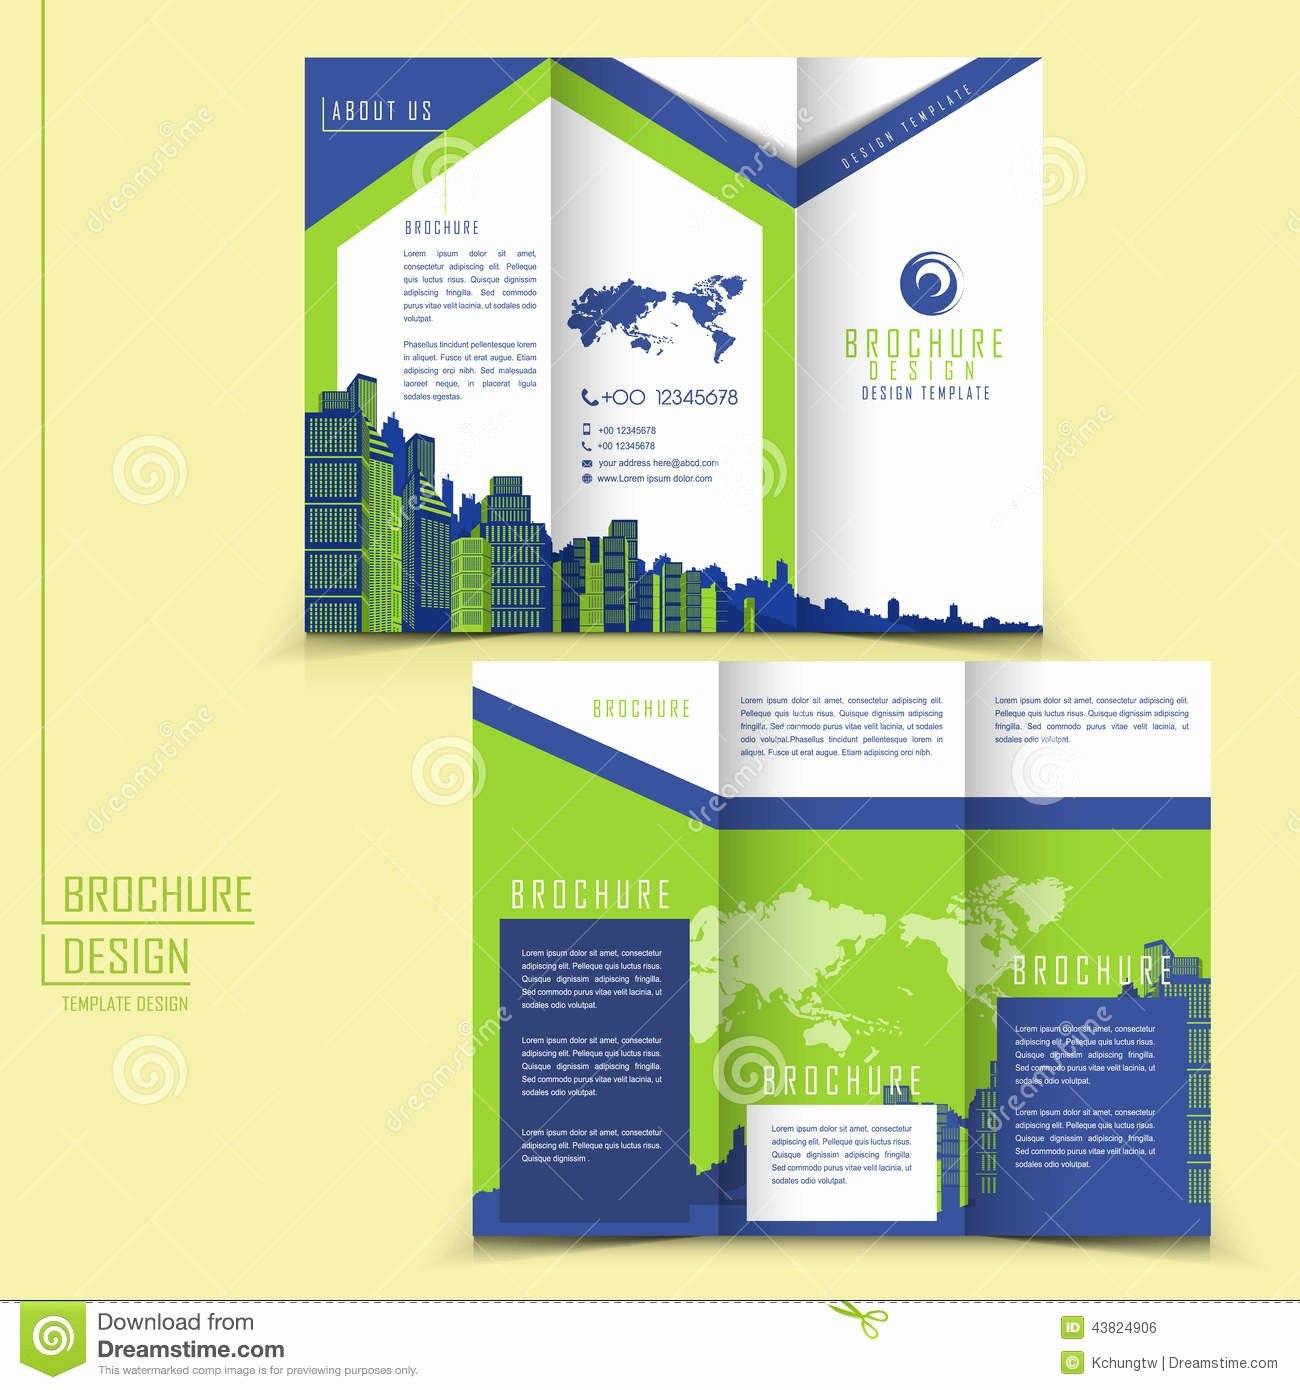 Folding Brochure Templates Template Ideas Fold Word Best Of Regarding 3 Fold Brochure Template Free Download